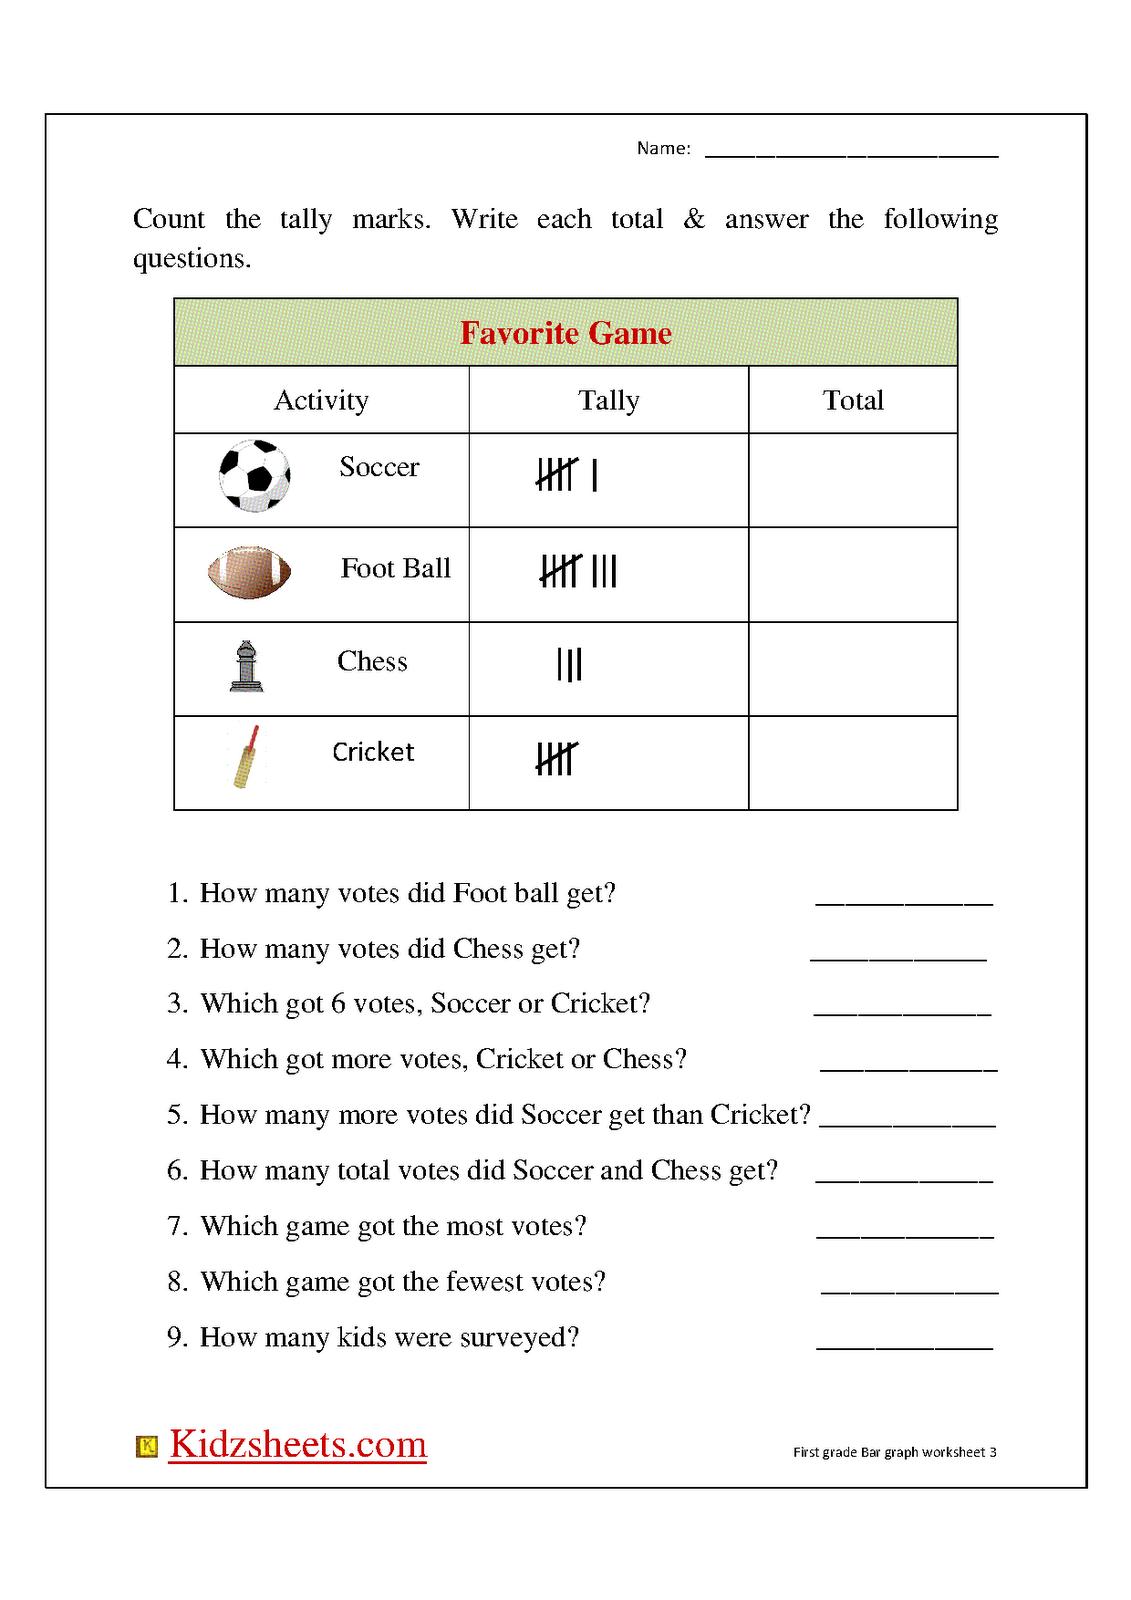 small resolution of Kidz Worksheets: First Grade Bar Graph3